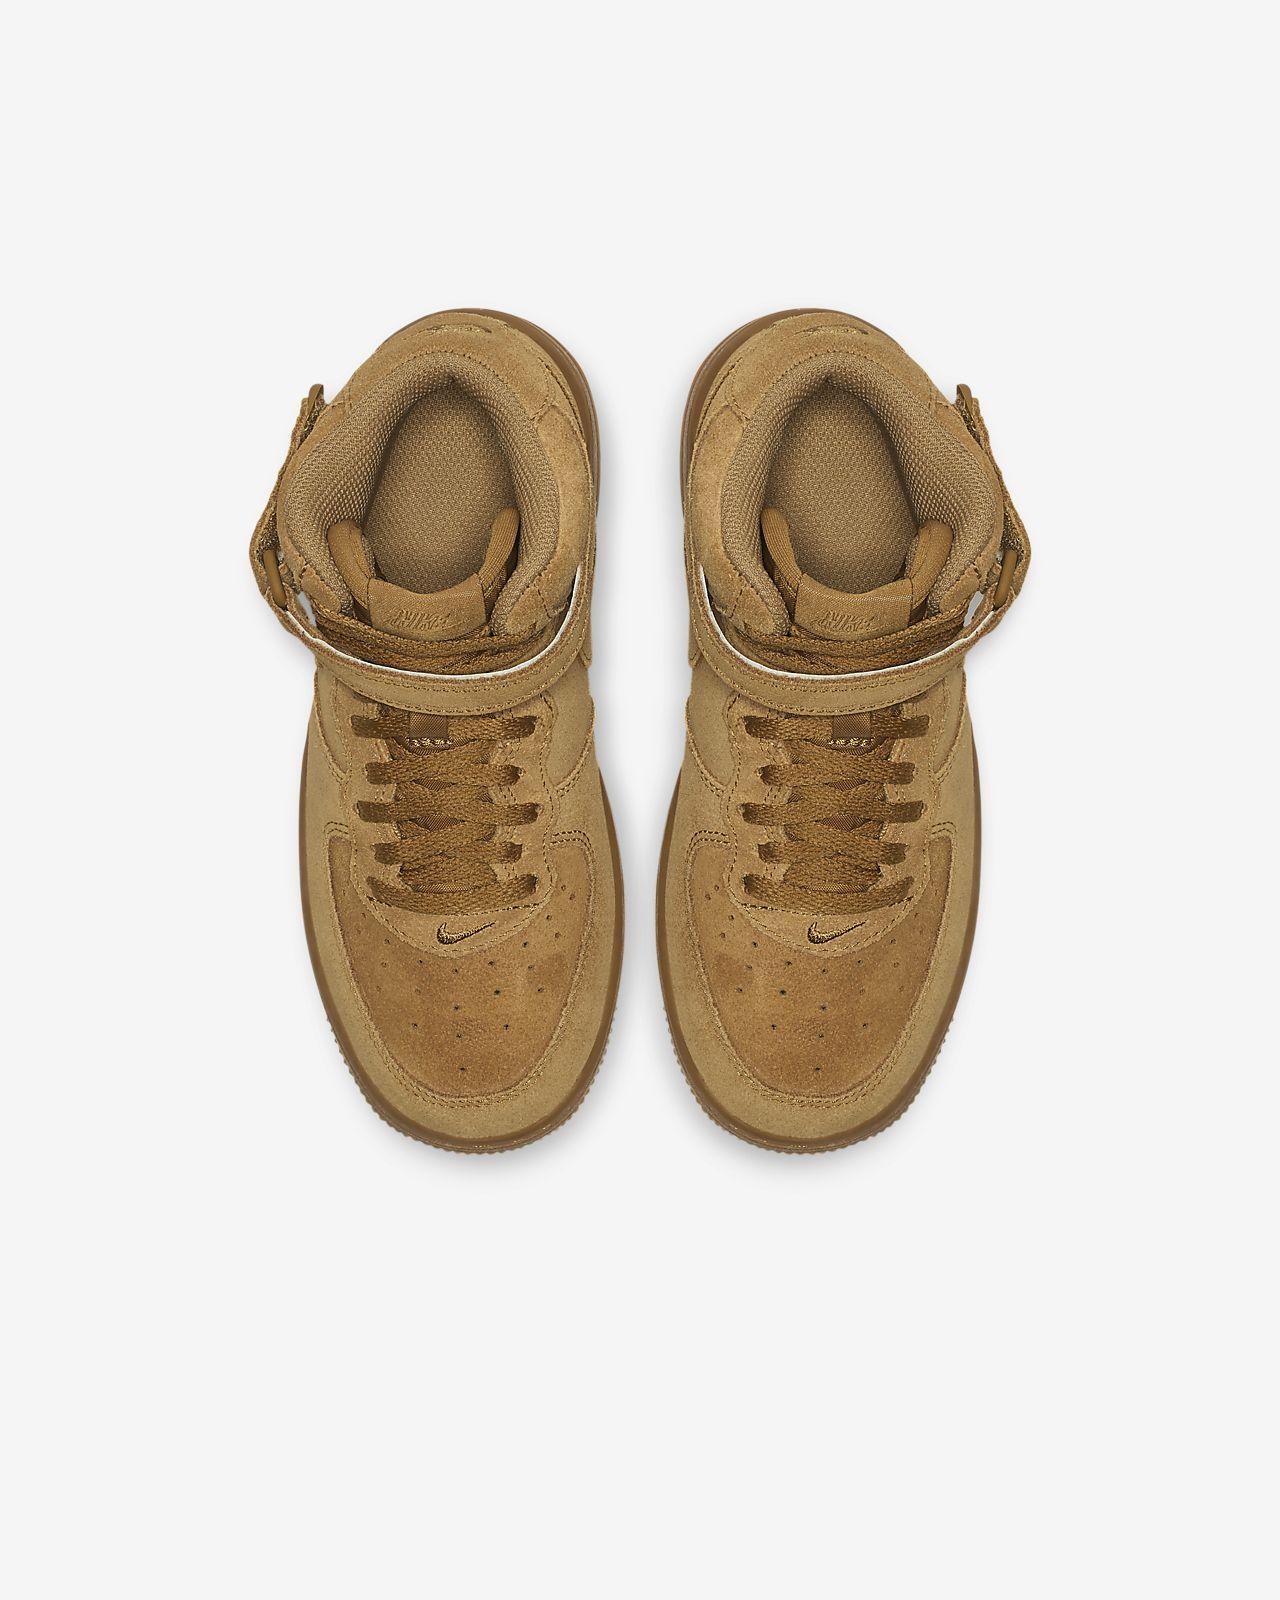 349860e24df1 Nike Air Force 1 Mid LV8 Younger Kids  Shoe. Nike.com AU